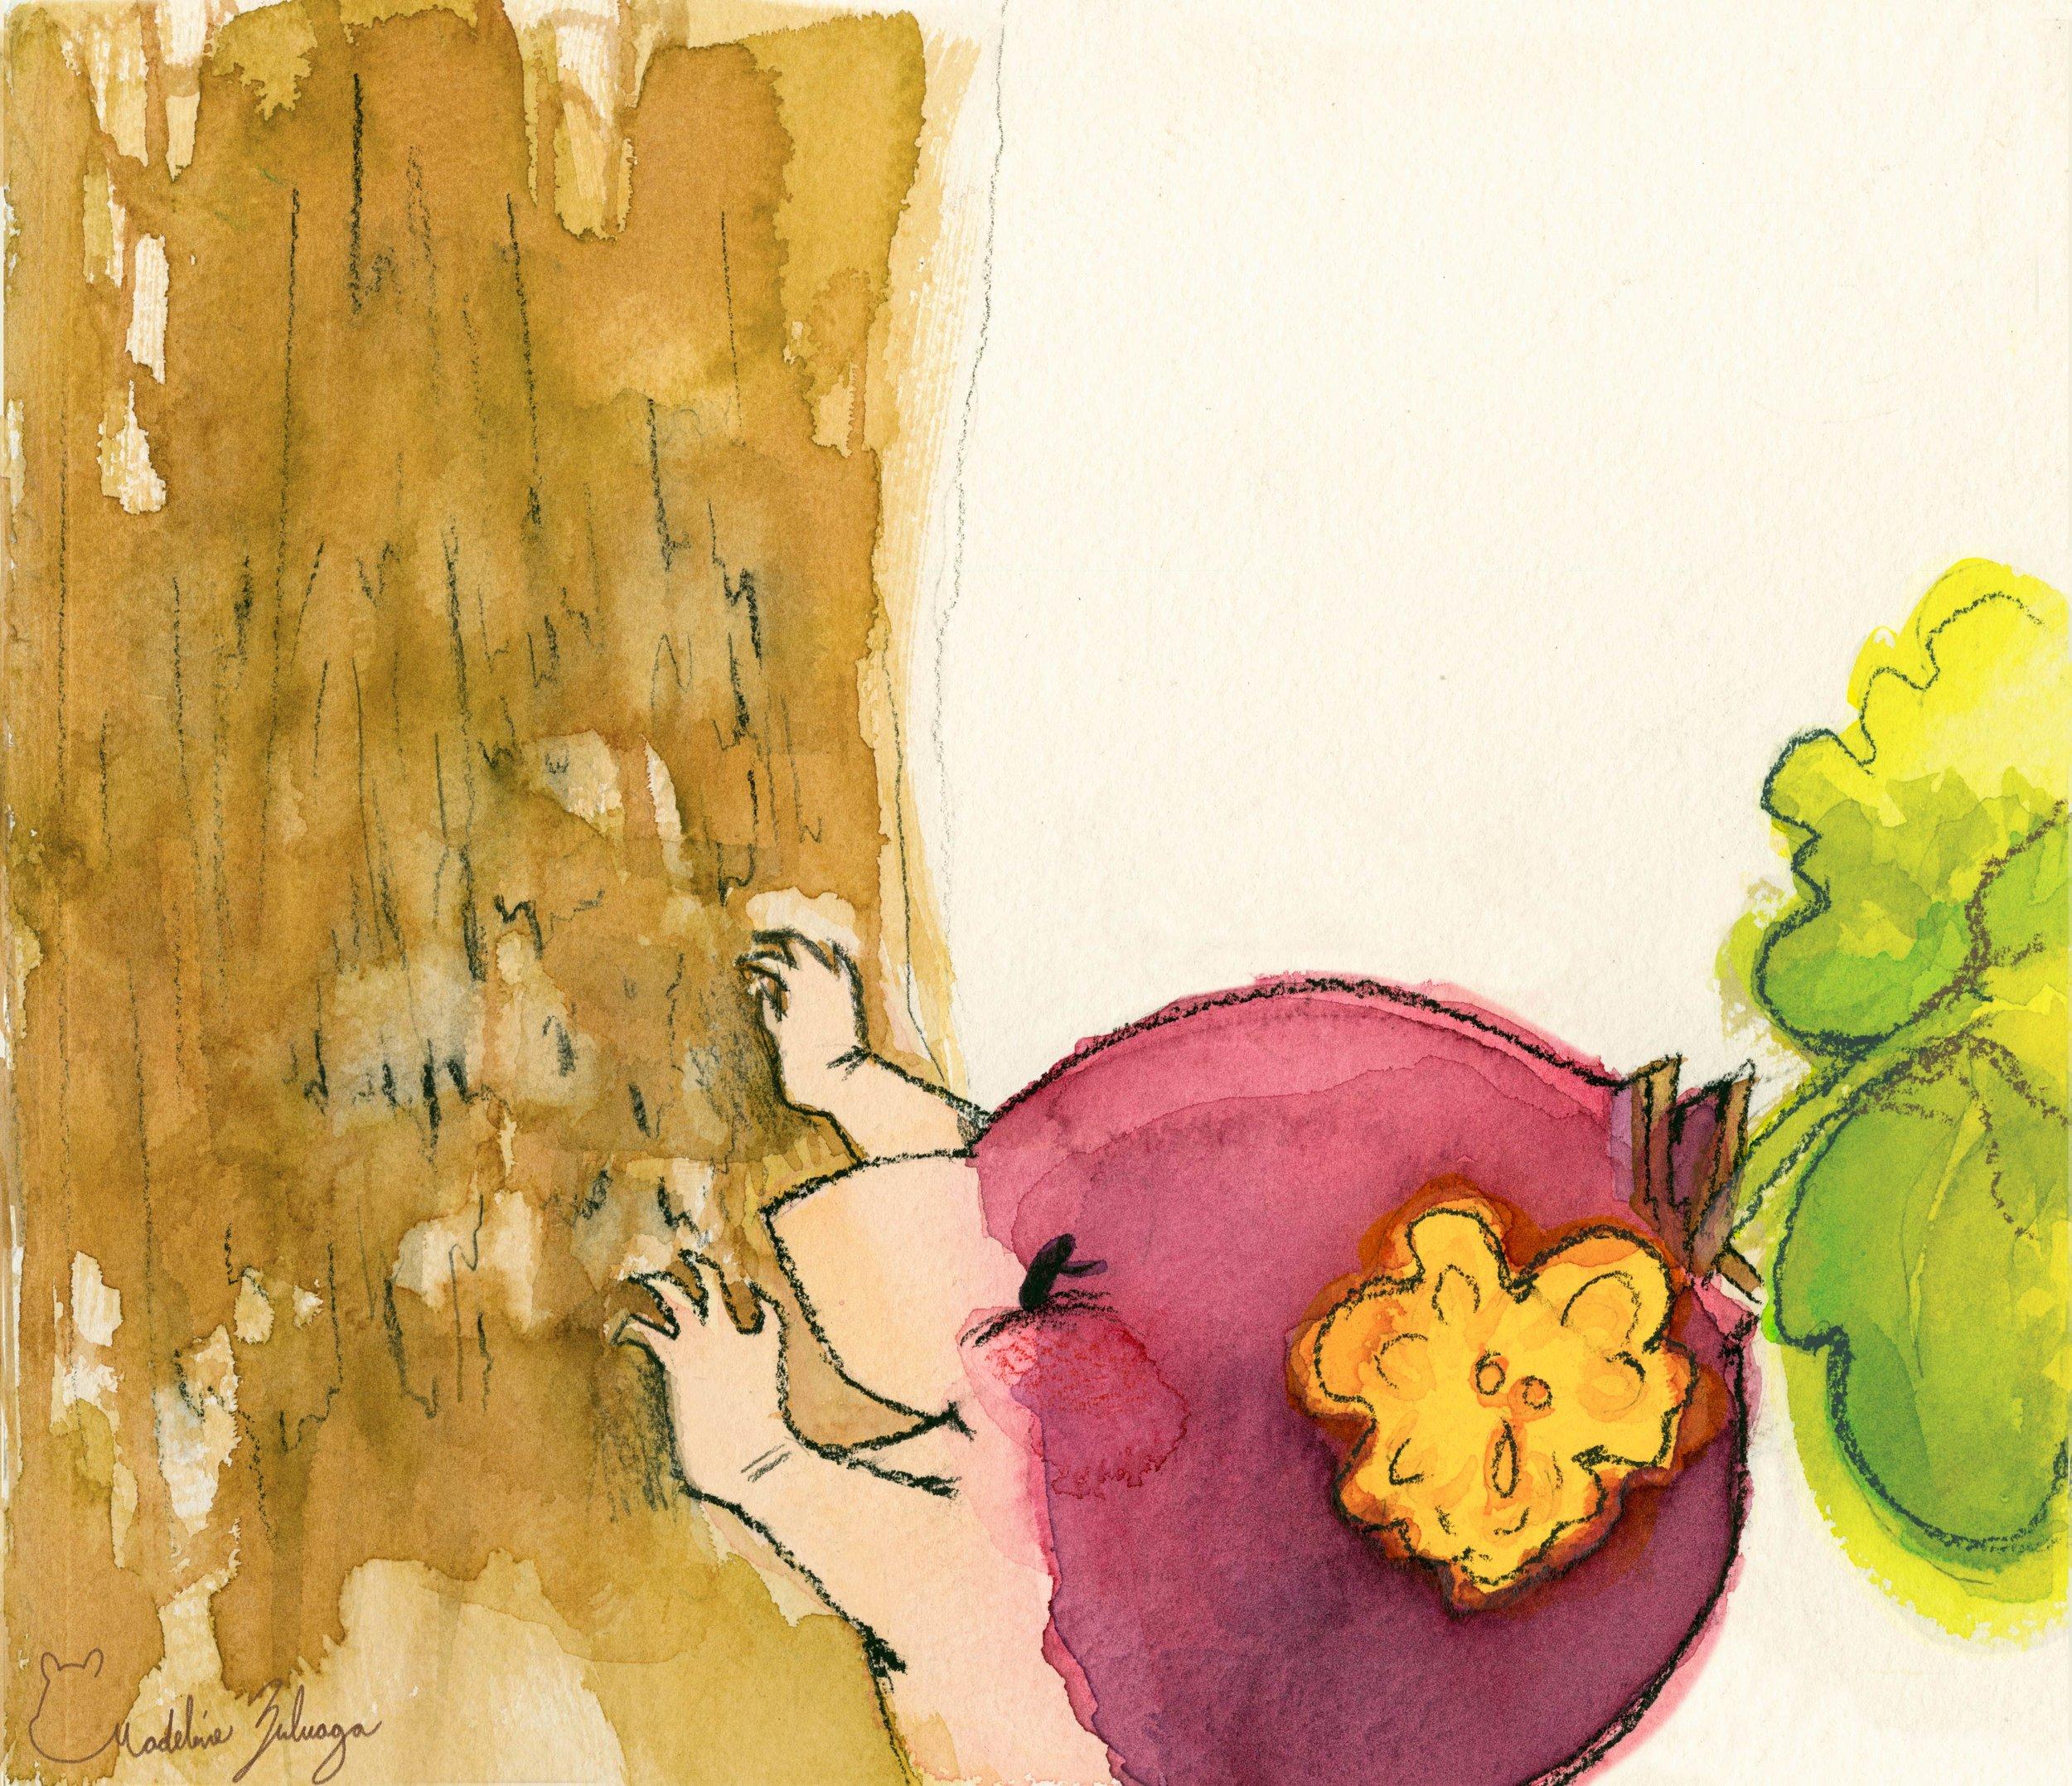 Madeline-Zuluaga-Turnip-Child-vignette-1.jpg